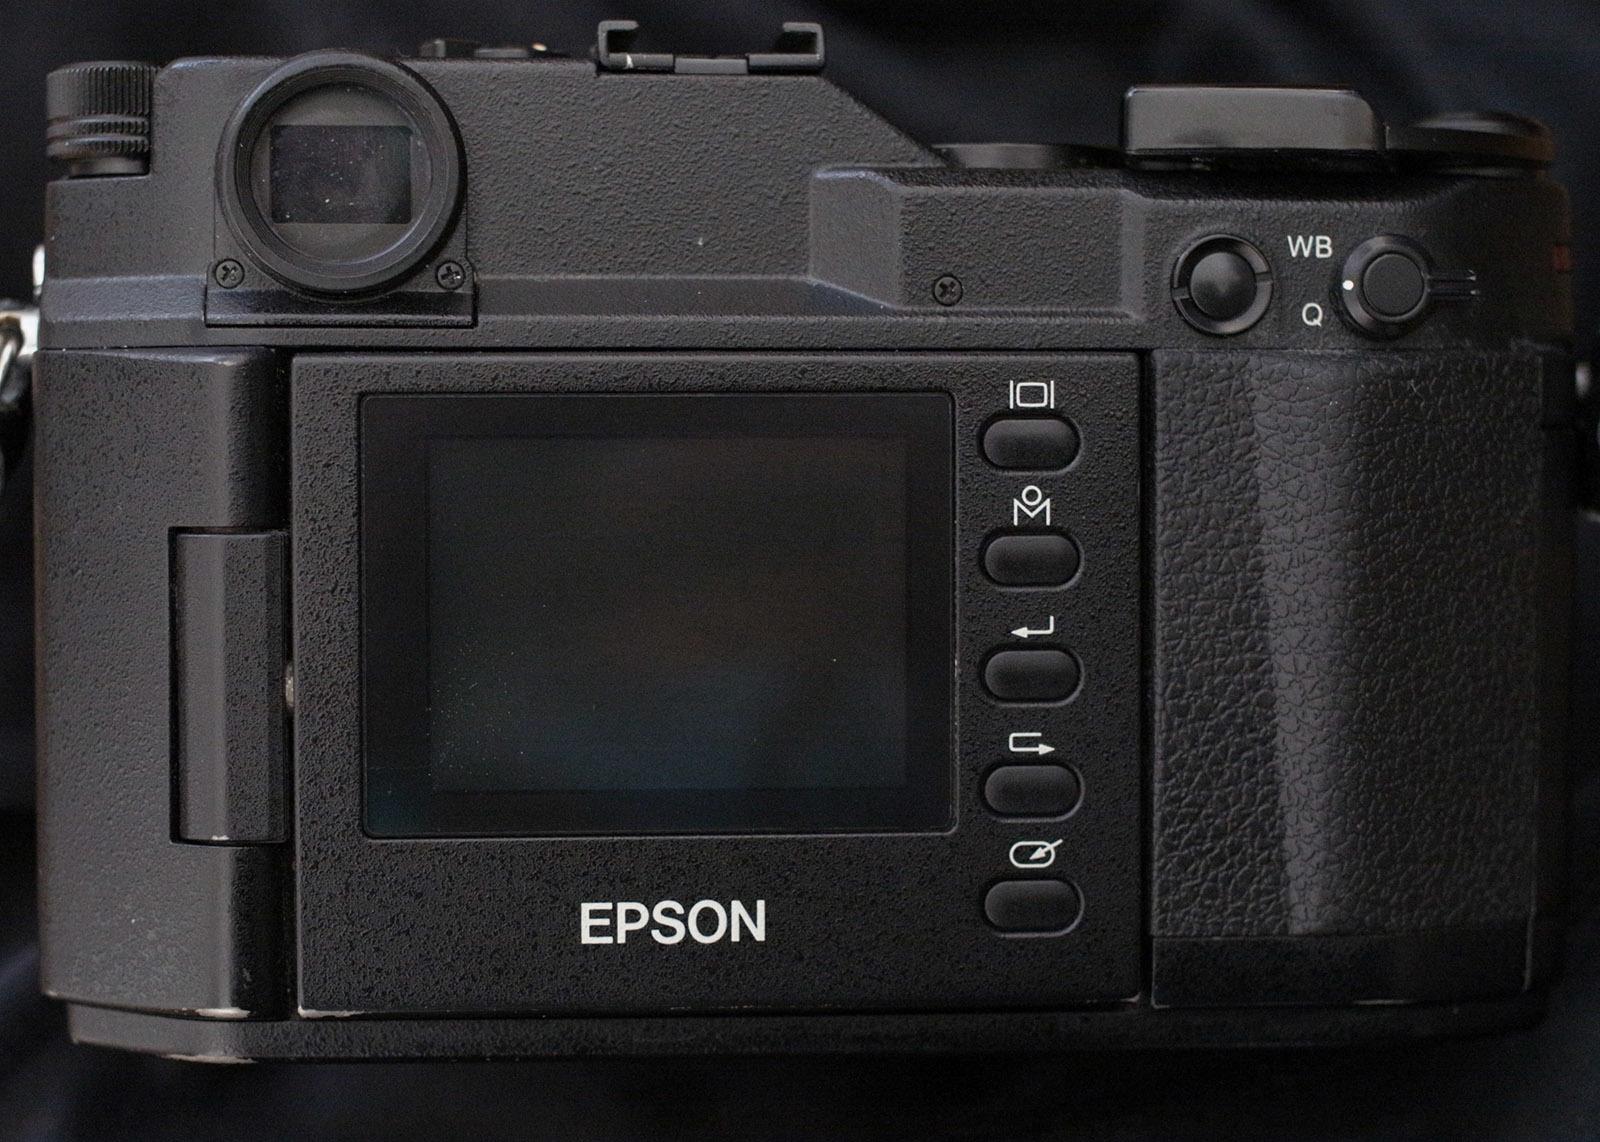 Epson Rangefinder Digital Camera R-D1s_e0367501_14090429.jpg